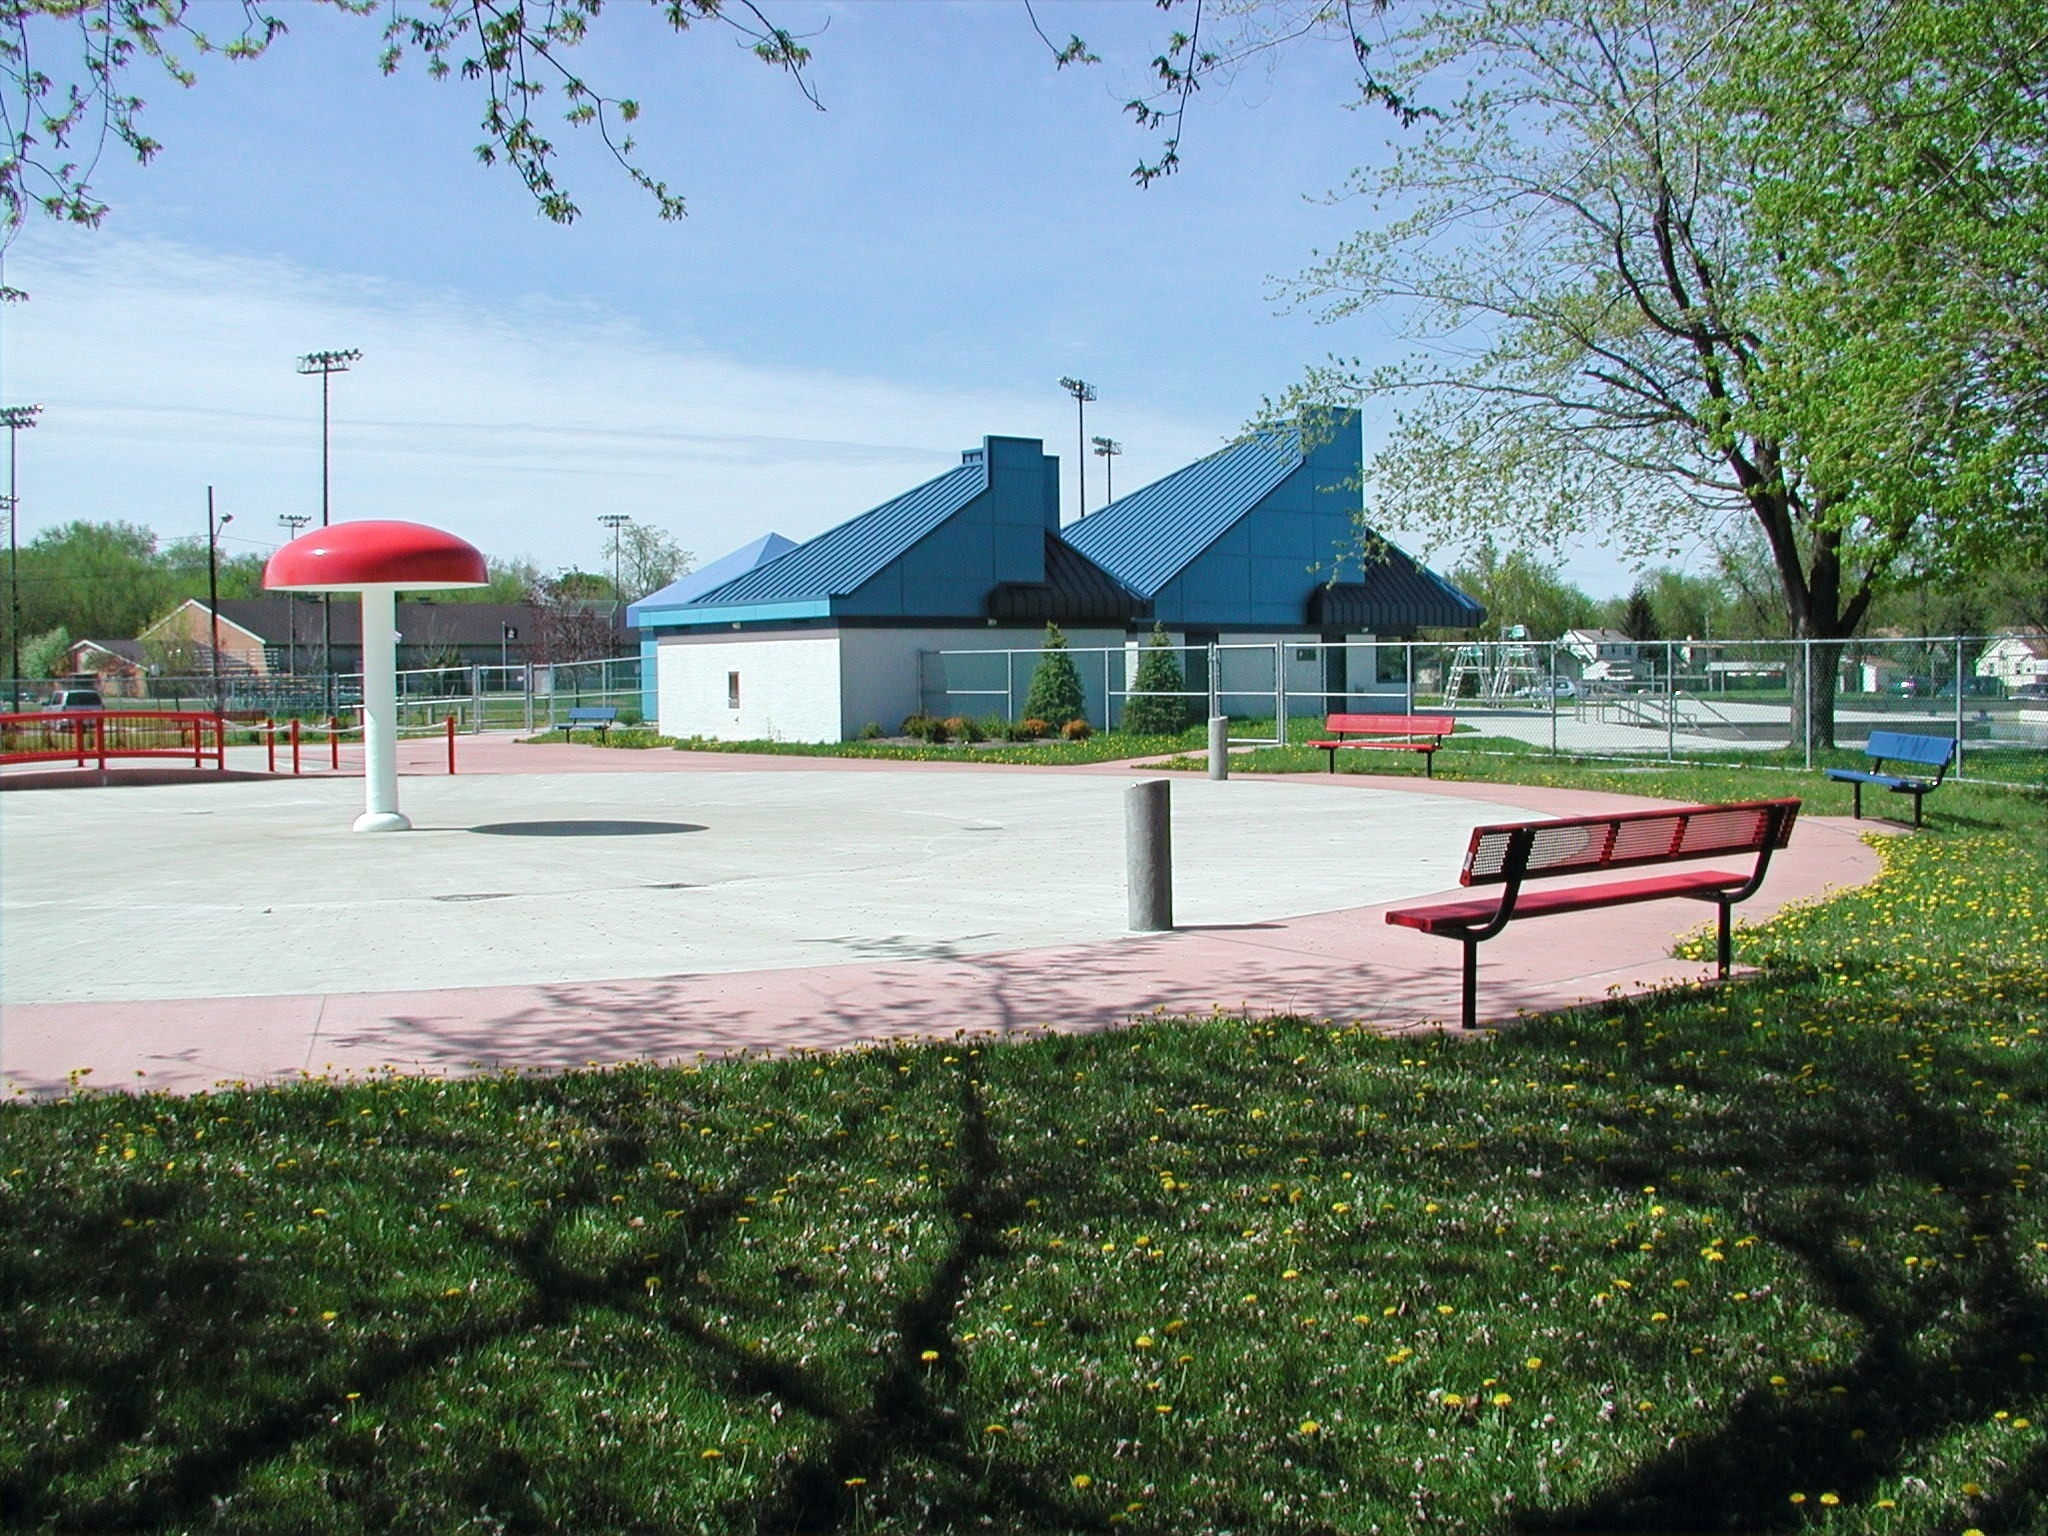 West Seneca Pool Renovations